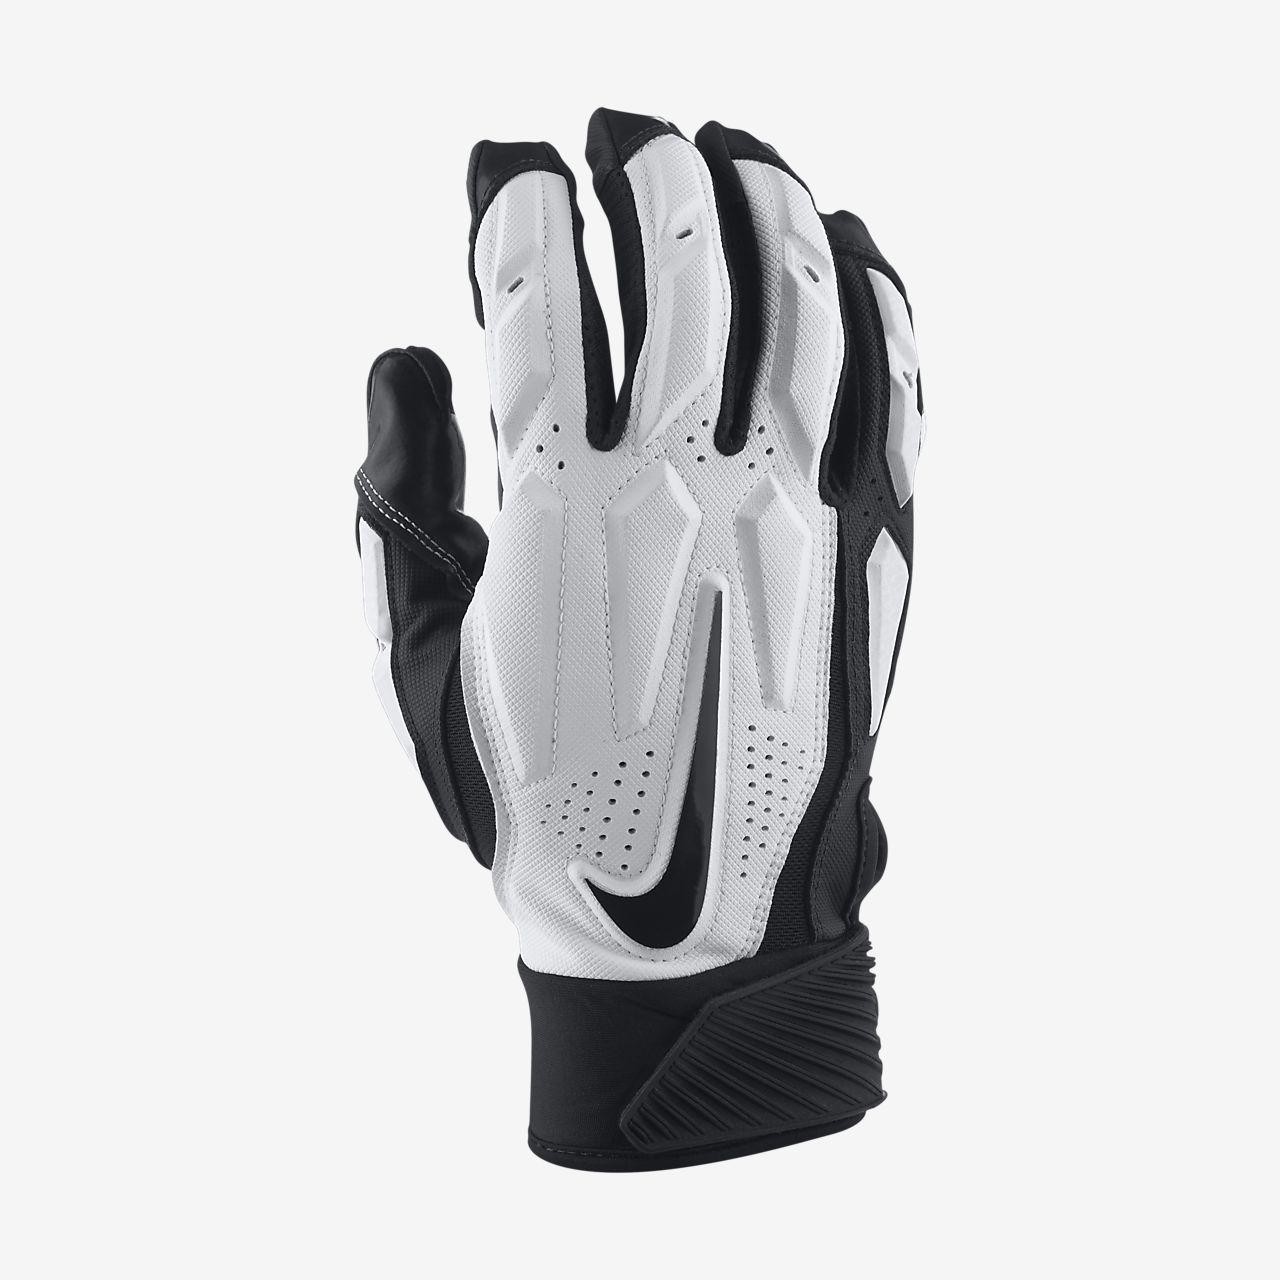 01652610ce7 Nike D-Tack 6.0 Football Gloves. Nike.com